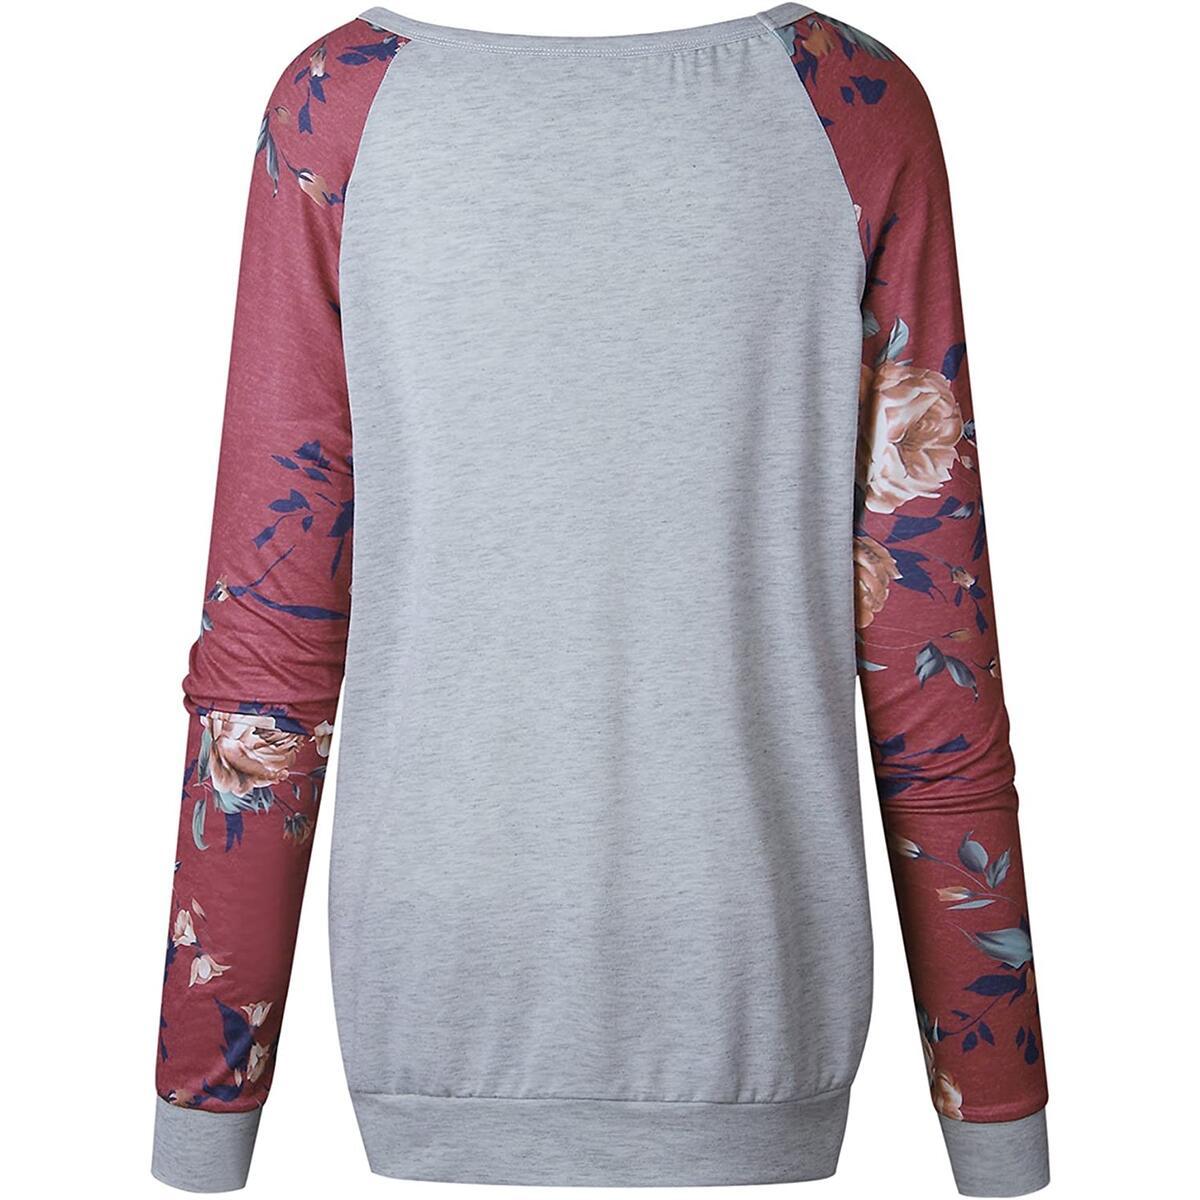 Minipeach Women's O Neck Long Sleeve Floral Print T-Shirts Casual Blouse Tops